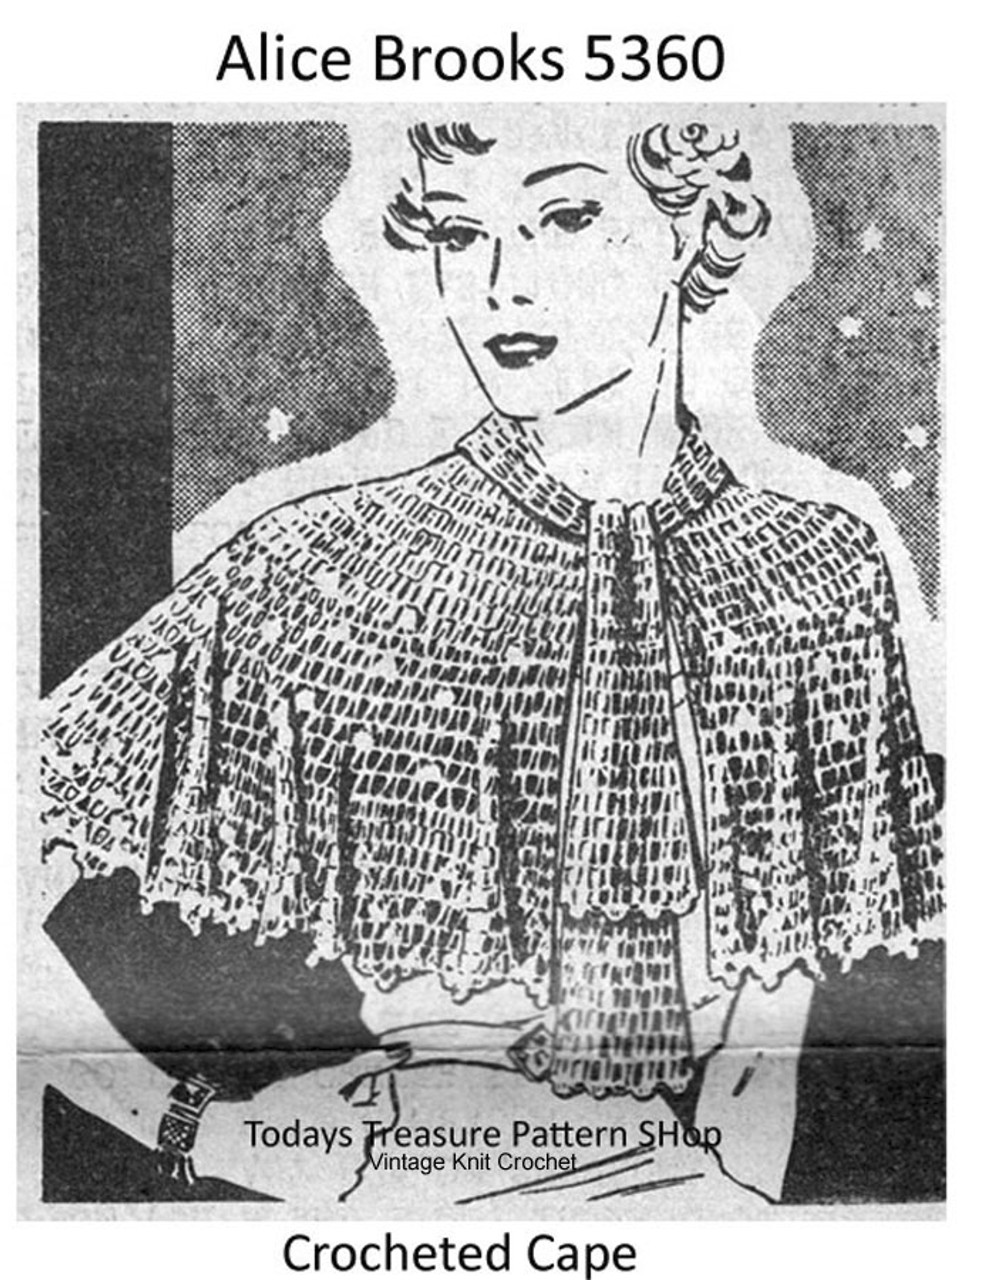 Vintage Crochet Lace Capelet Pattern, Mail Order 5360